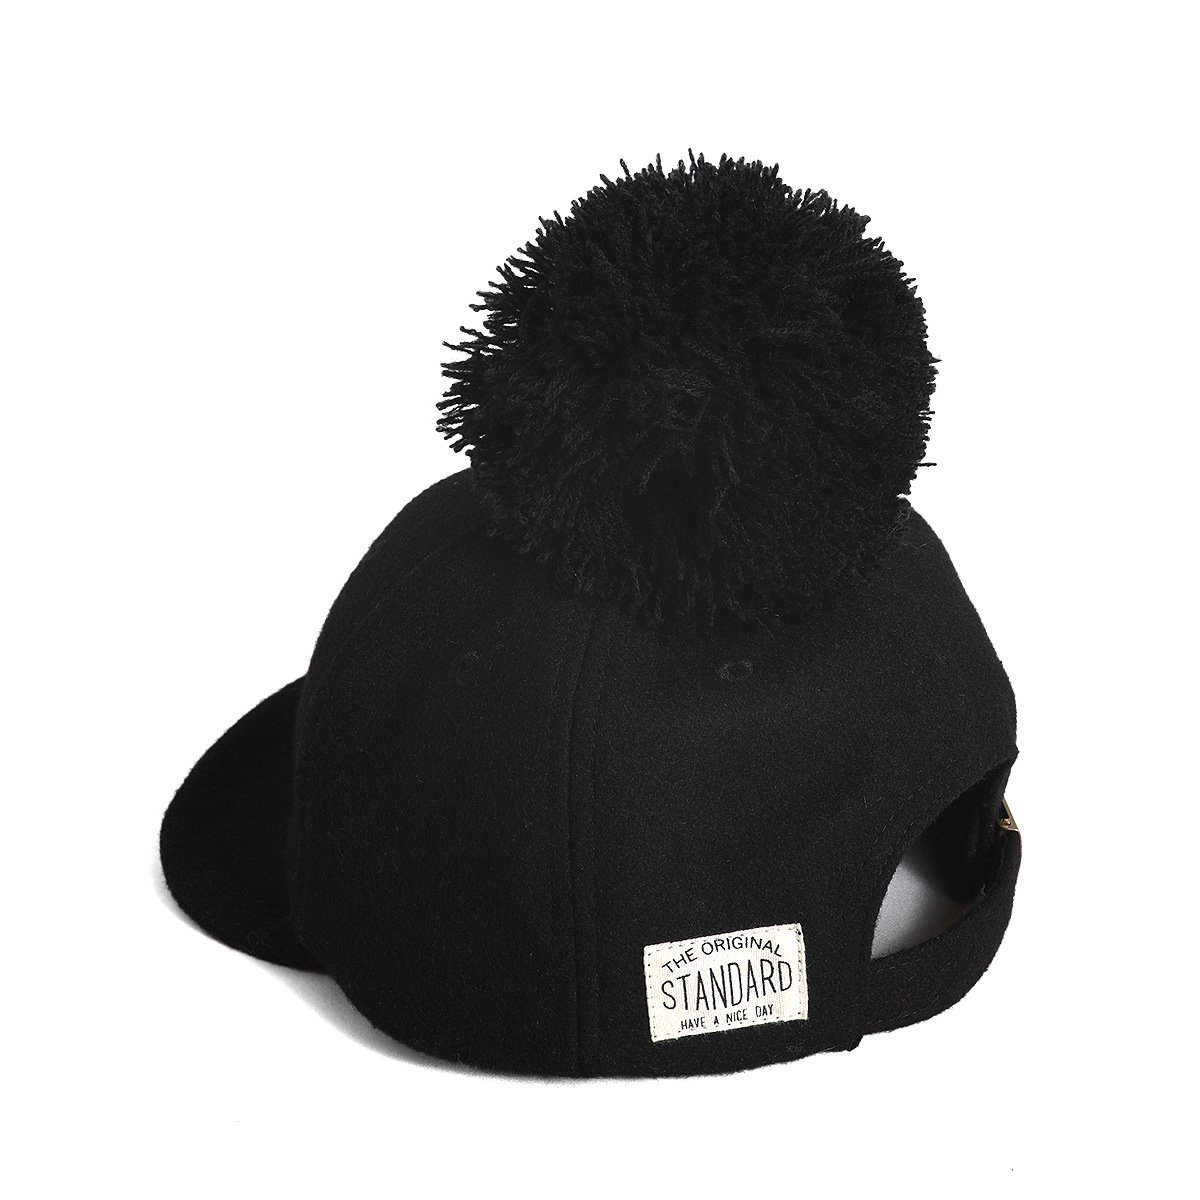 【KIDS】Wool Pom Cap 2 詳細画像6